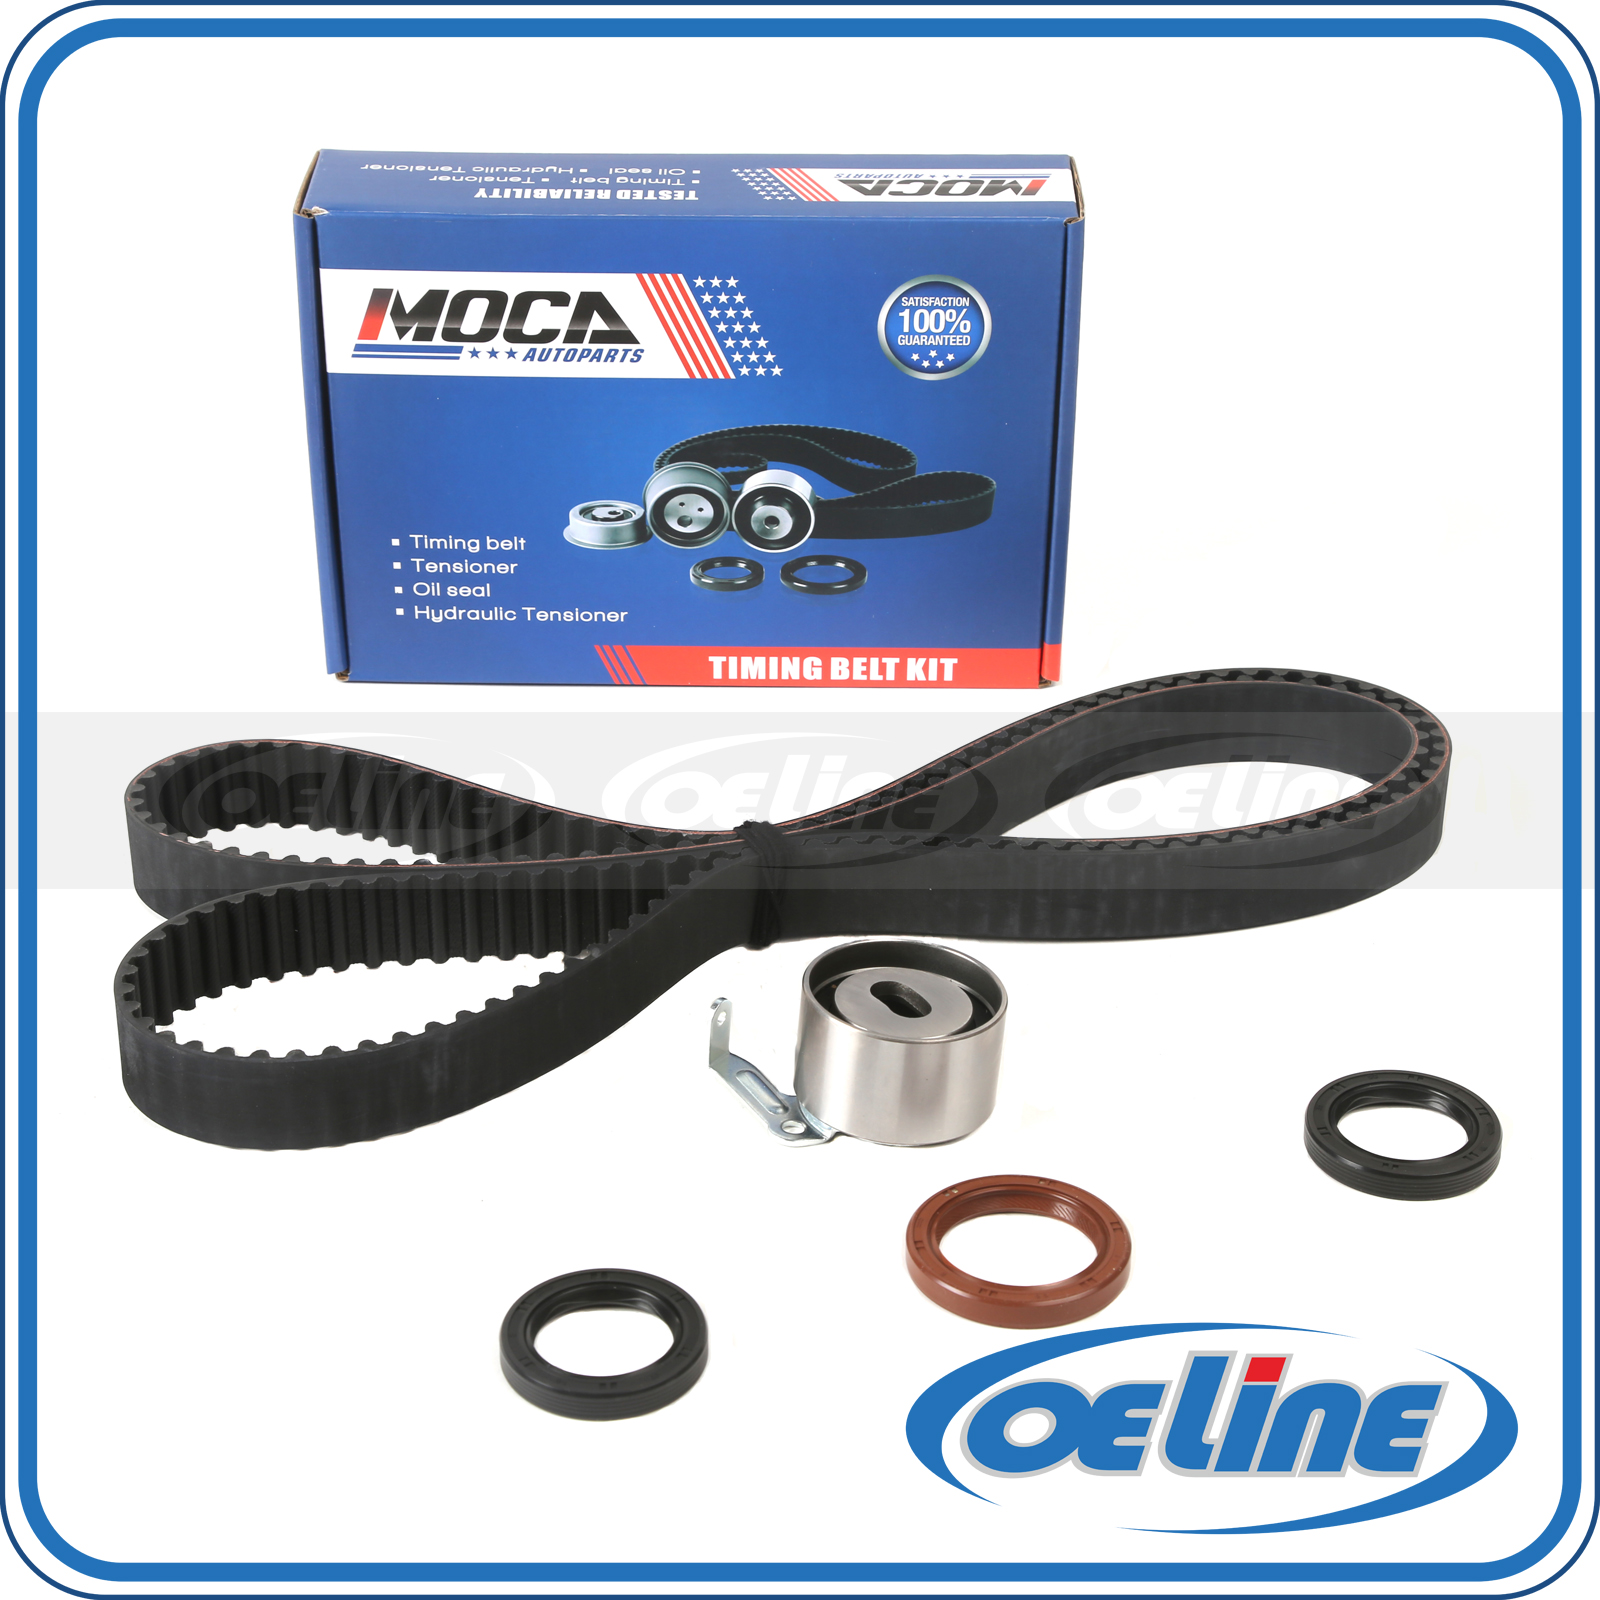 Timing Belt Kit For 91-98 Acura Legend TL 3.2L SOHC C32A1